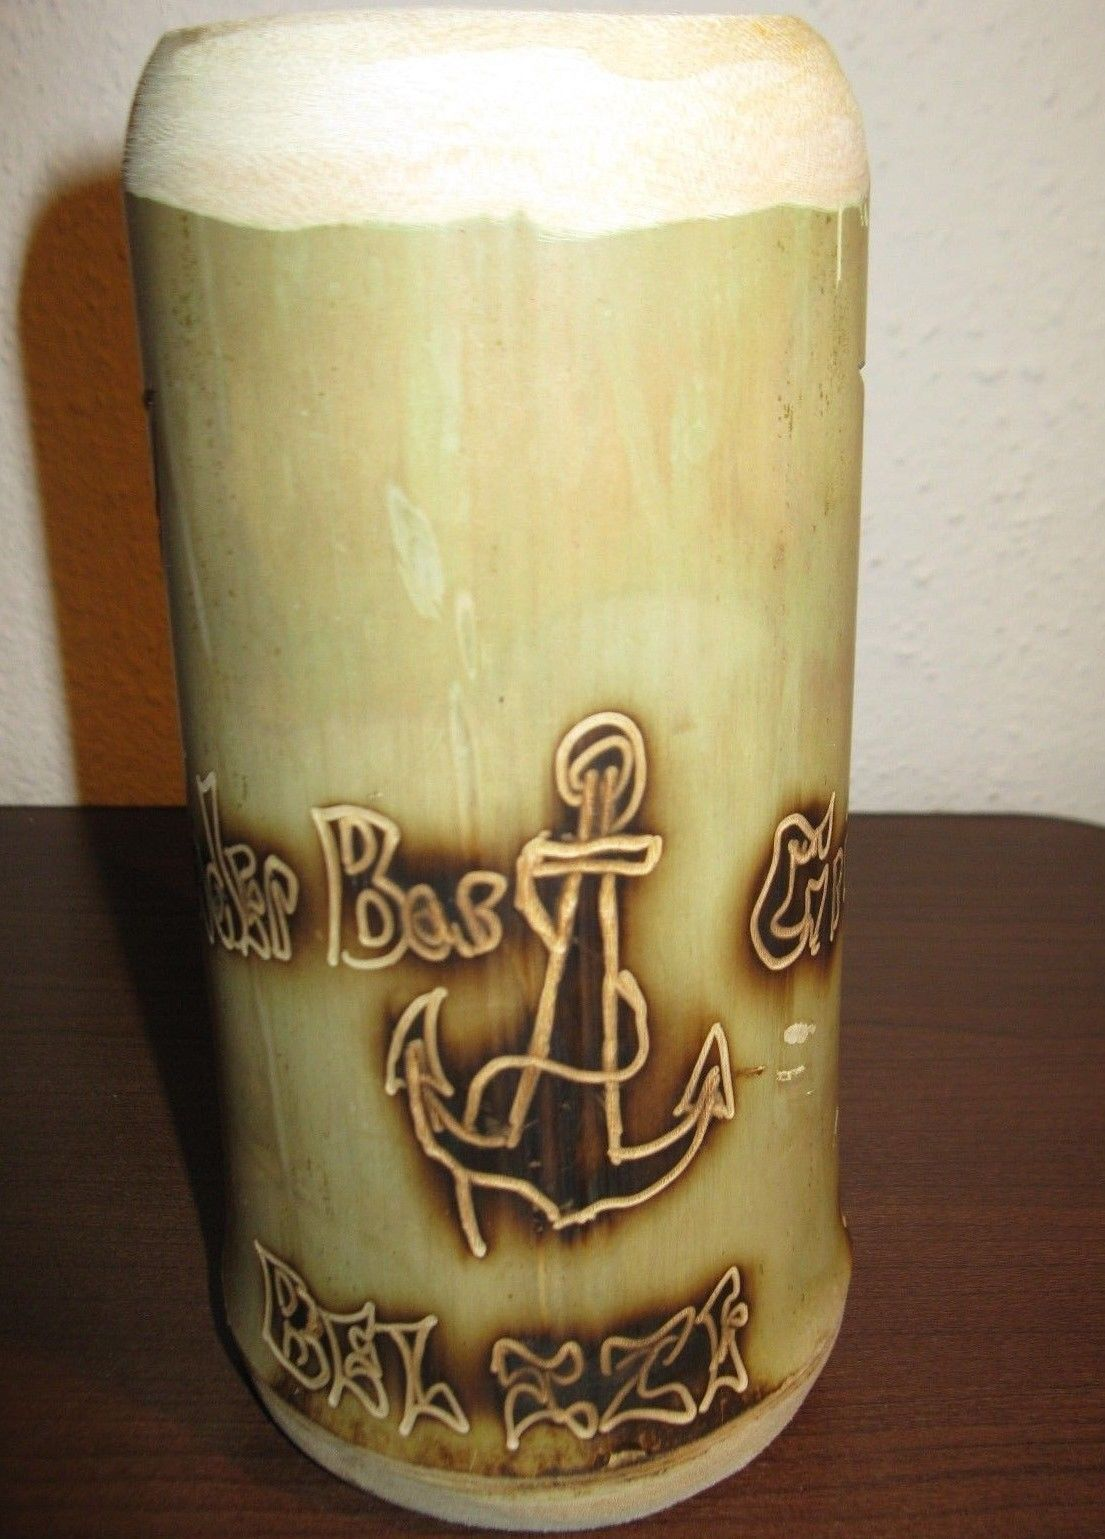 Unique Trader Bob Grill, California 6.5 in Green Bamboo Mug Nice! #R04